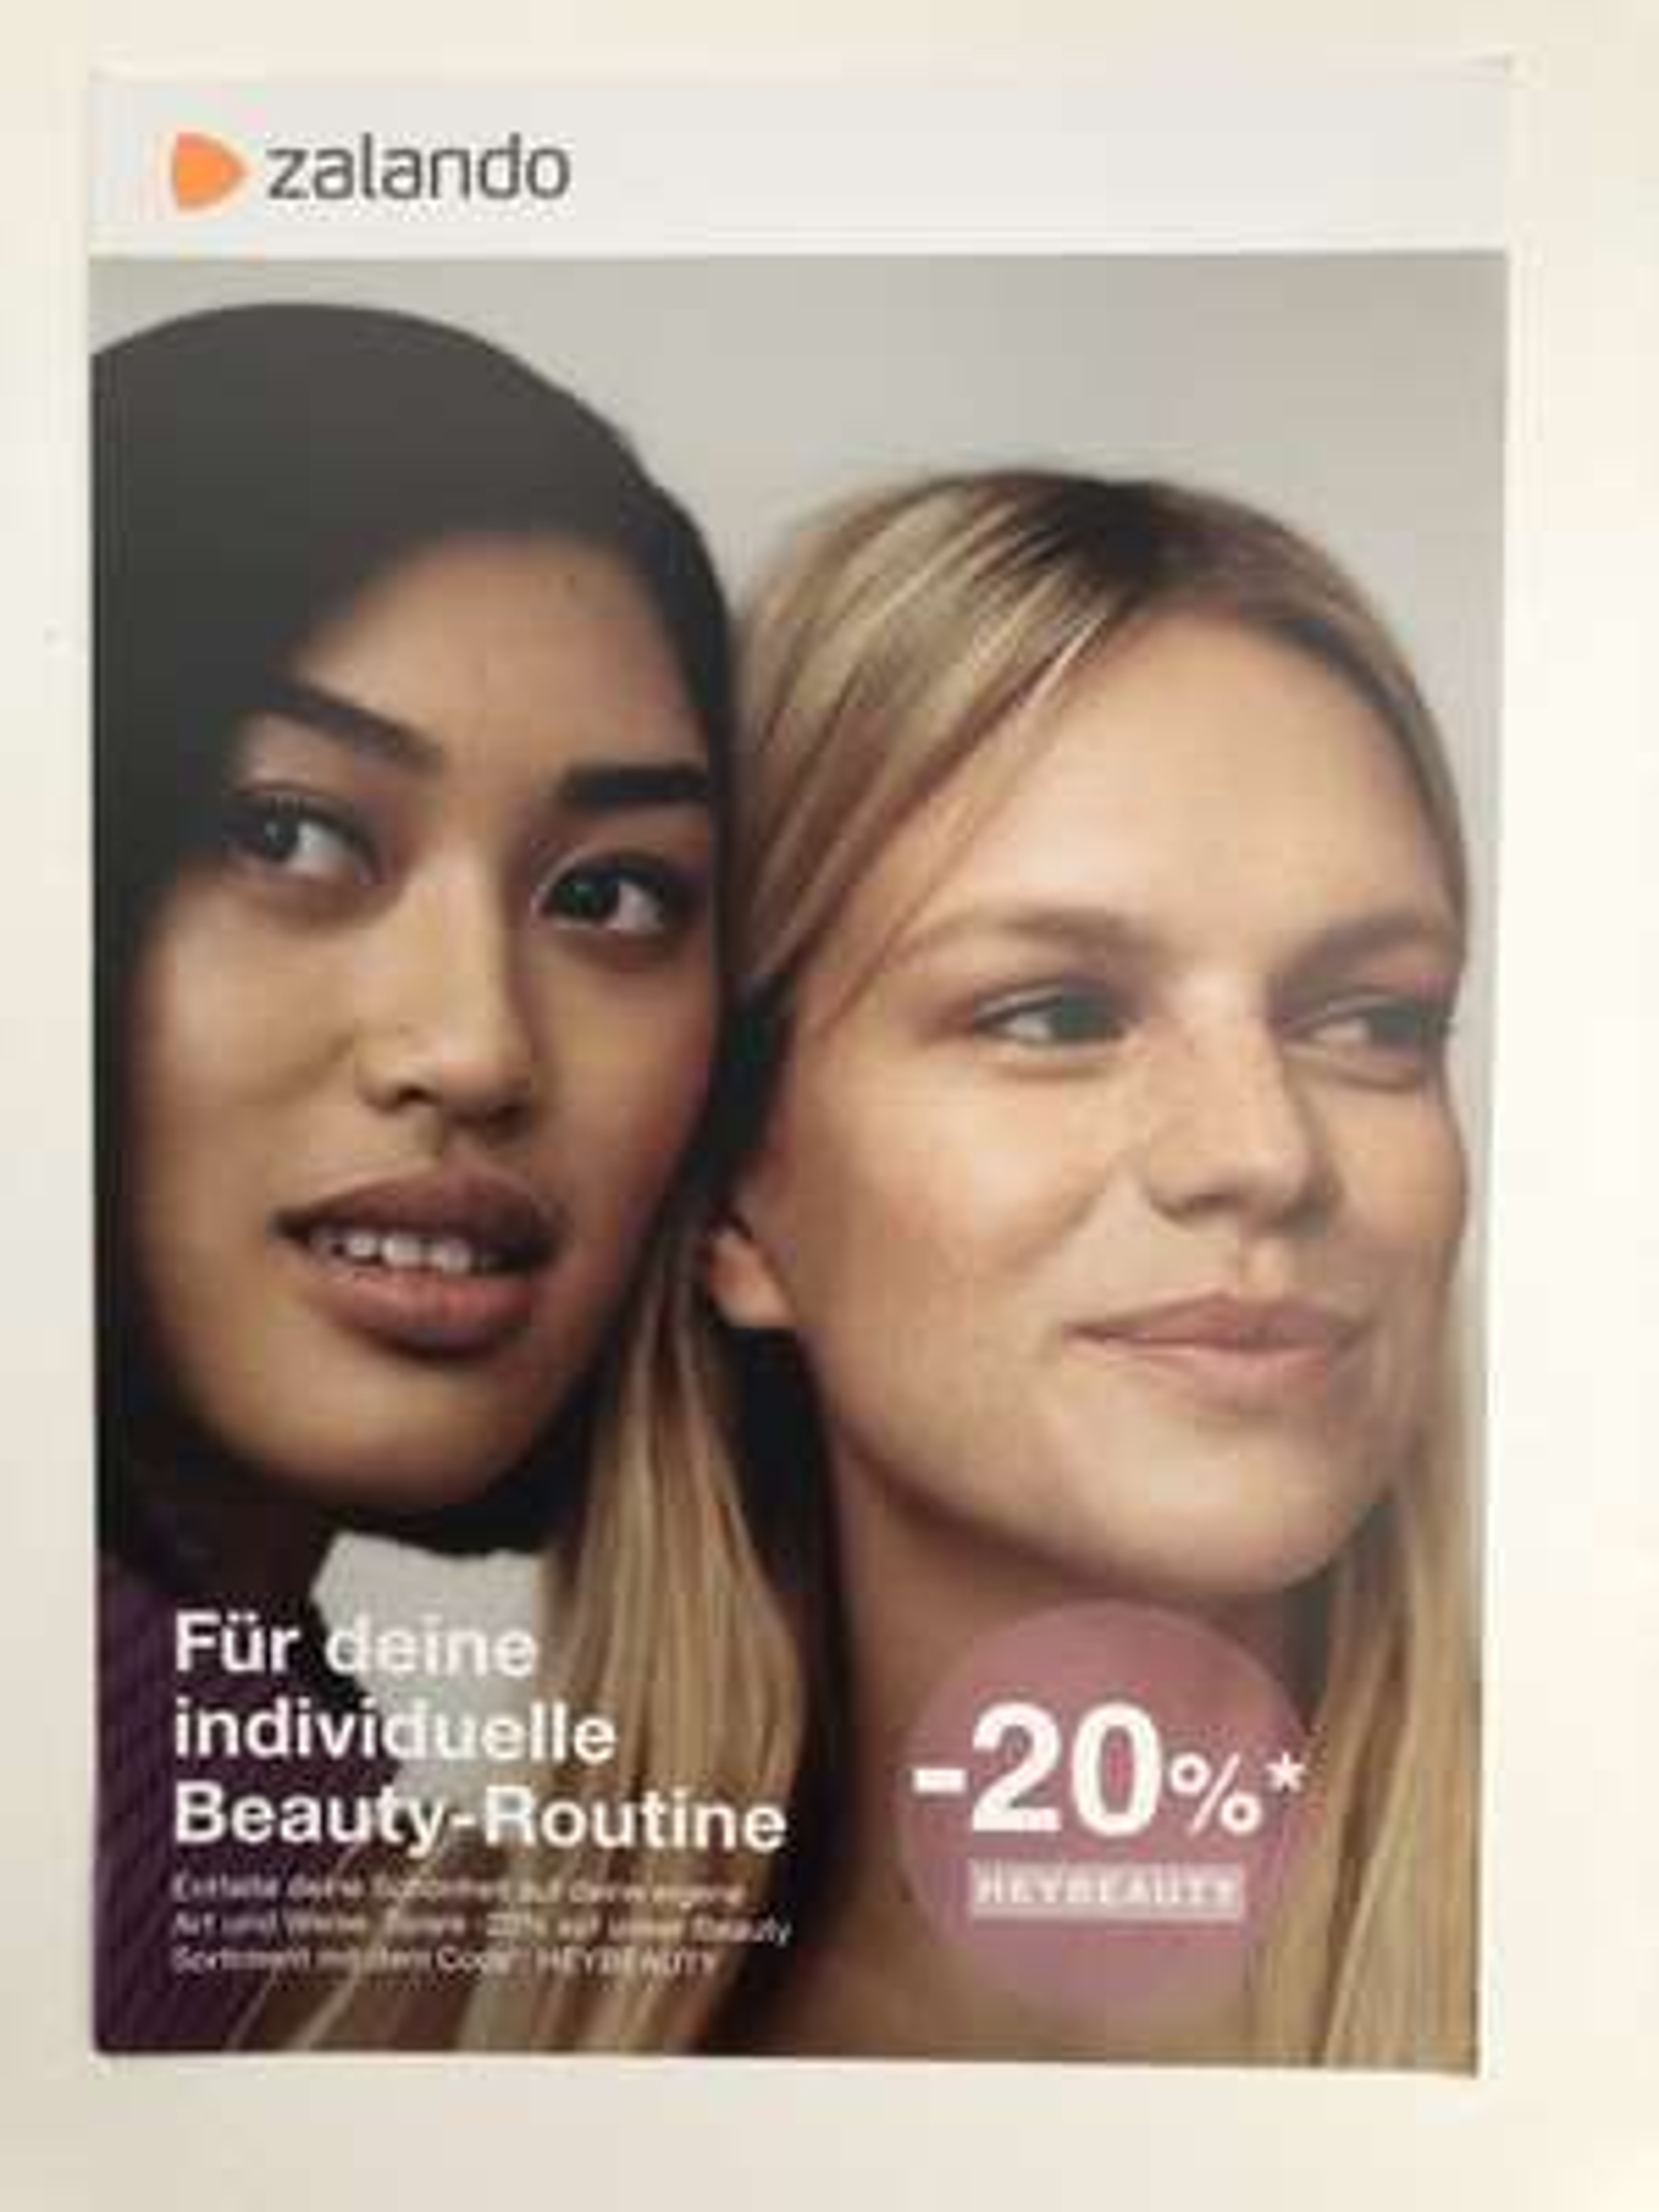 ZALANDO: -20% auf das Beauty-Sortiment